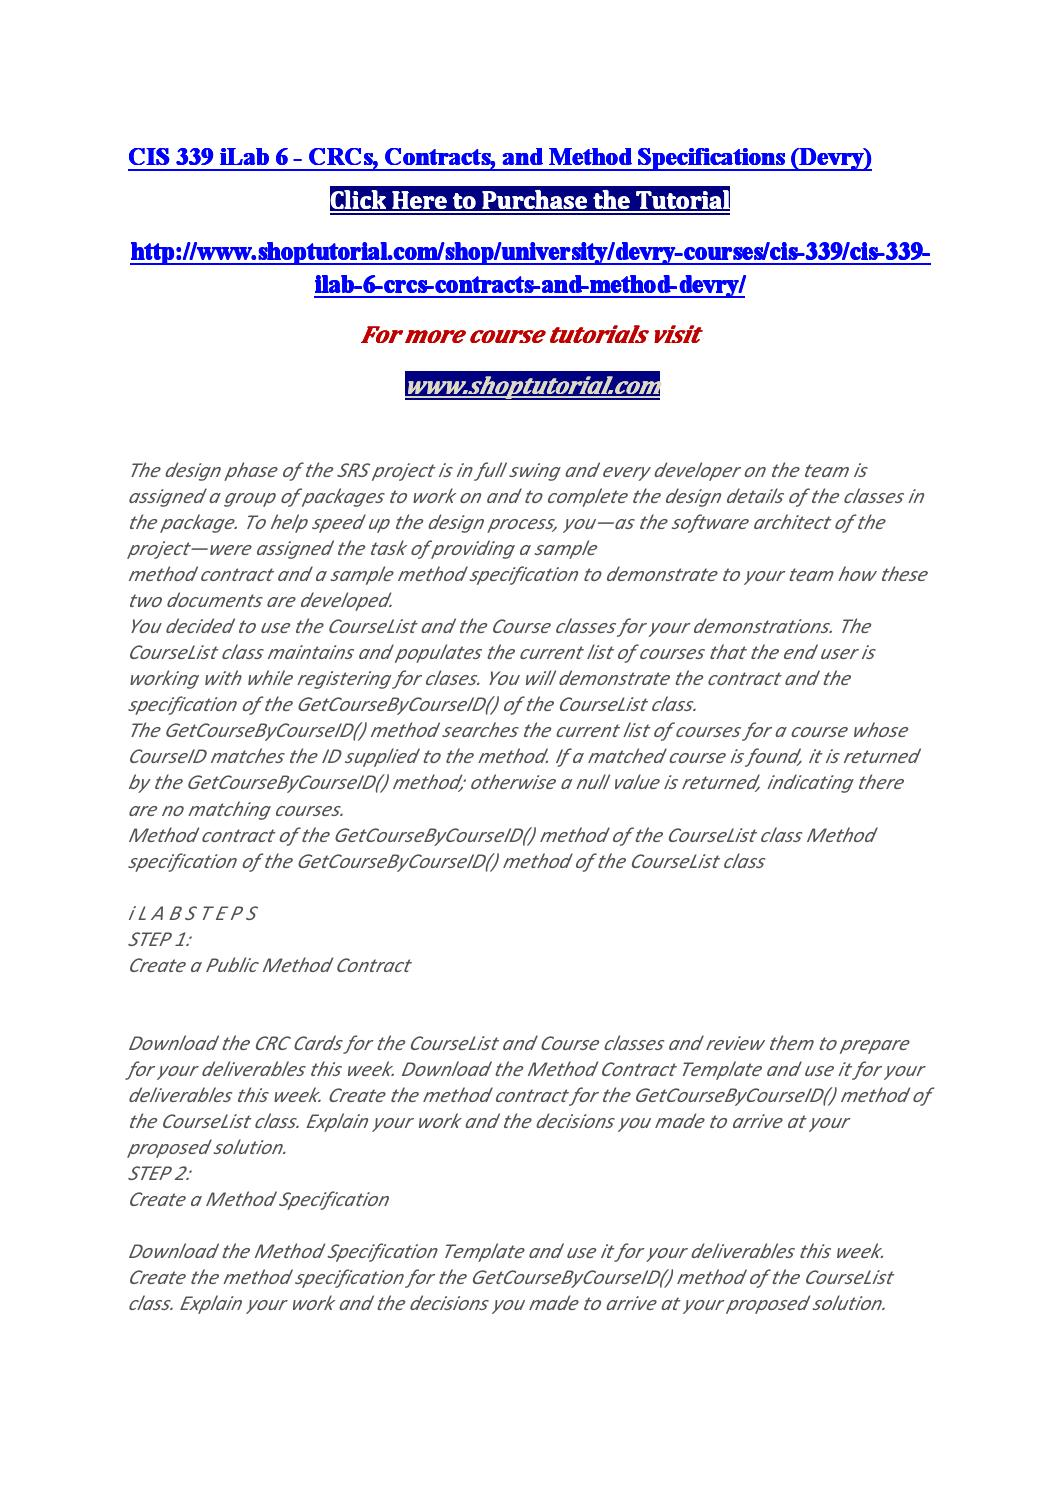 Cis 339 ilab 6 by AvaA bigail - issuu